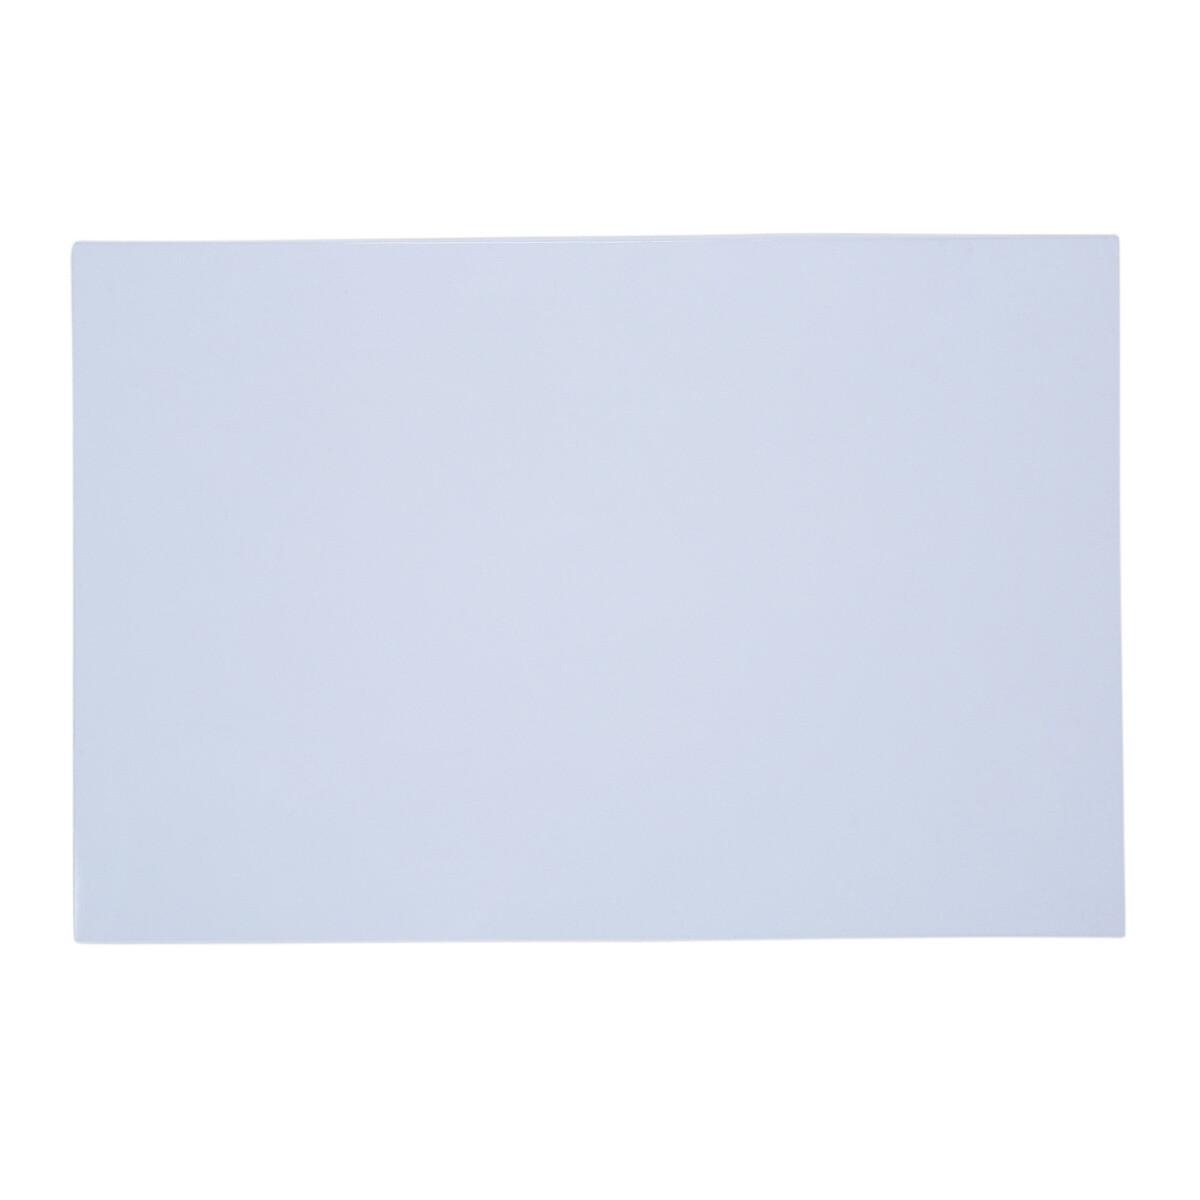 "Brio Pickguard Blanks 12"" x 17"" 3 Ply White"